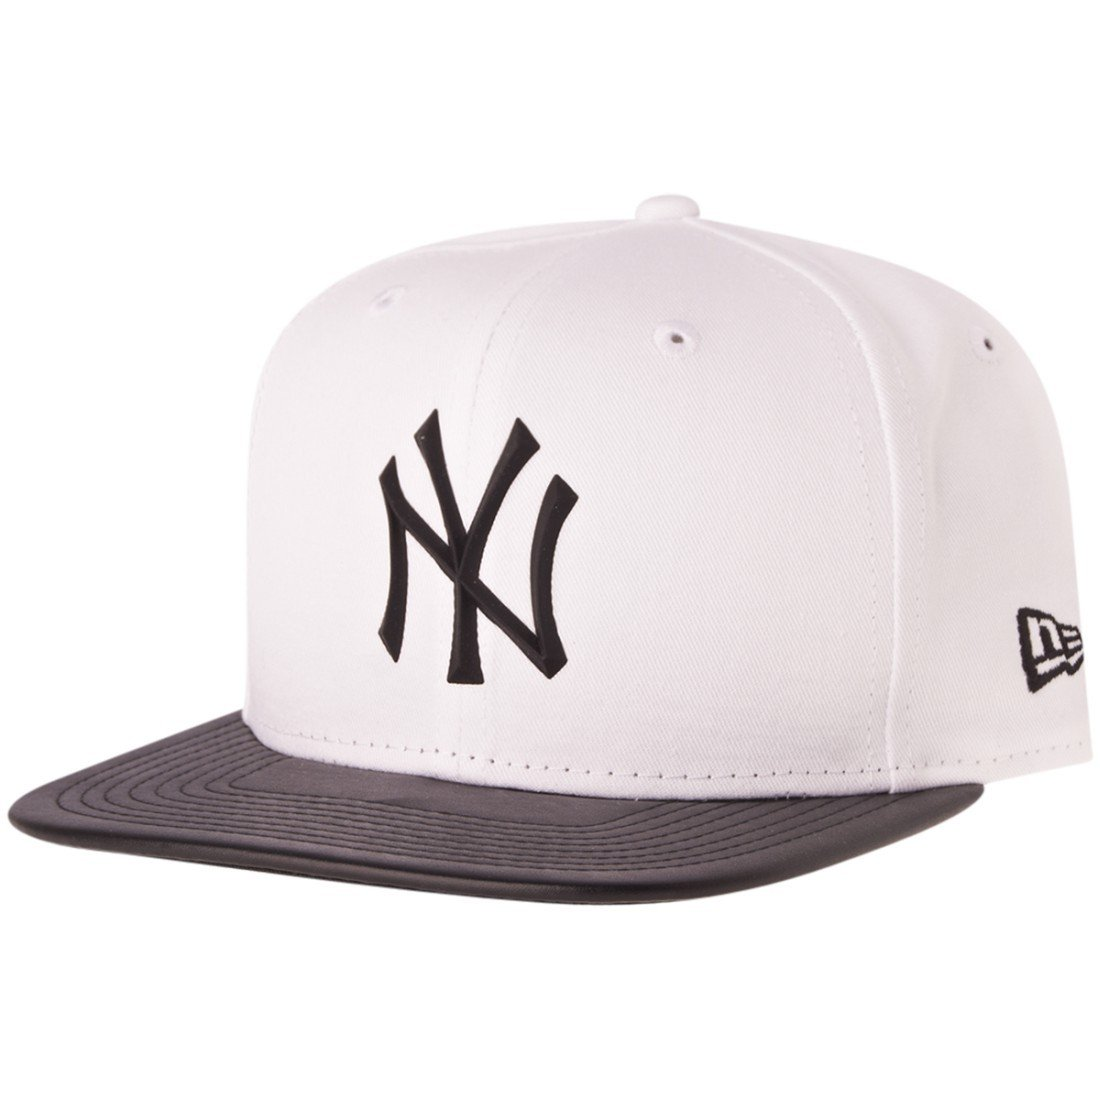 3715a4a7891f30 New Era 9FIFTY Rubber Prime New York Yankees Snapback White Black 80258991  SM: Amazon.co.uk: Clothing